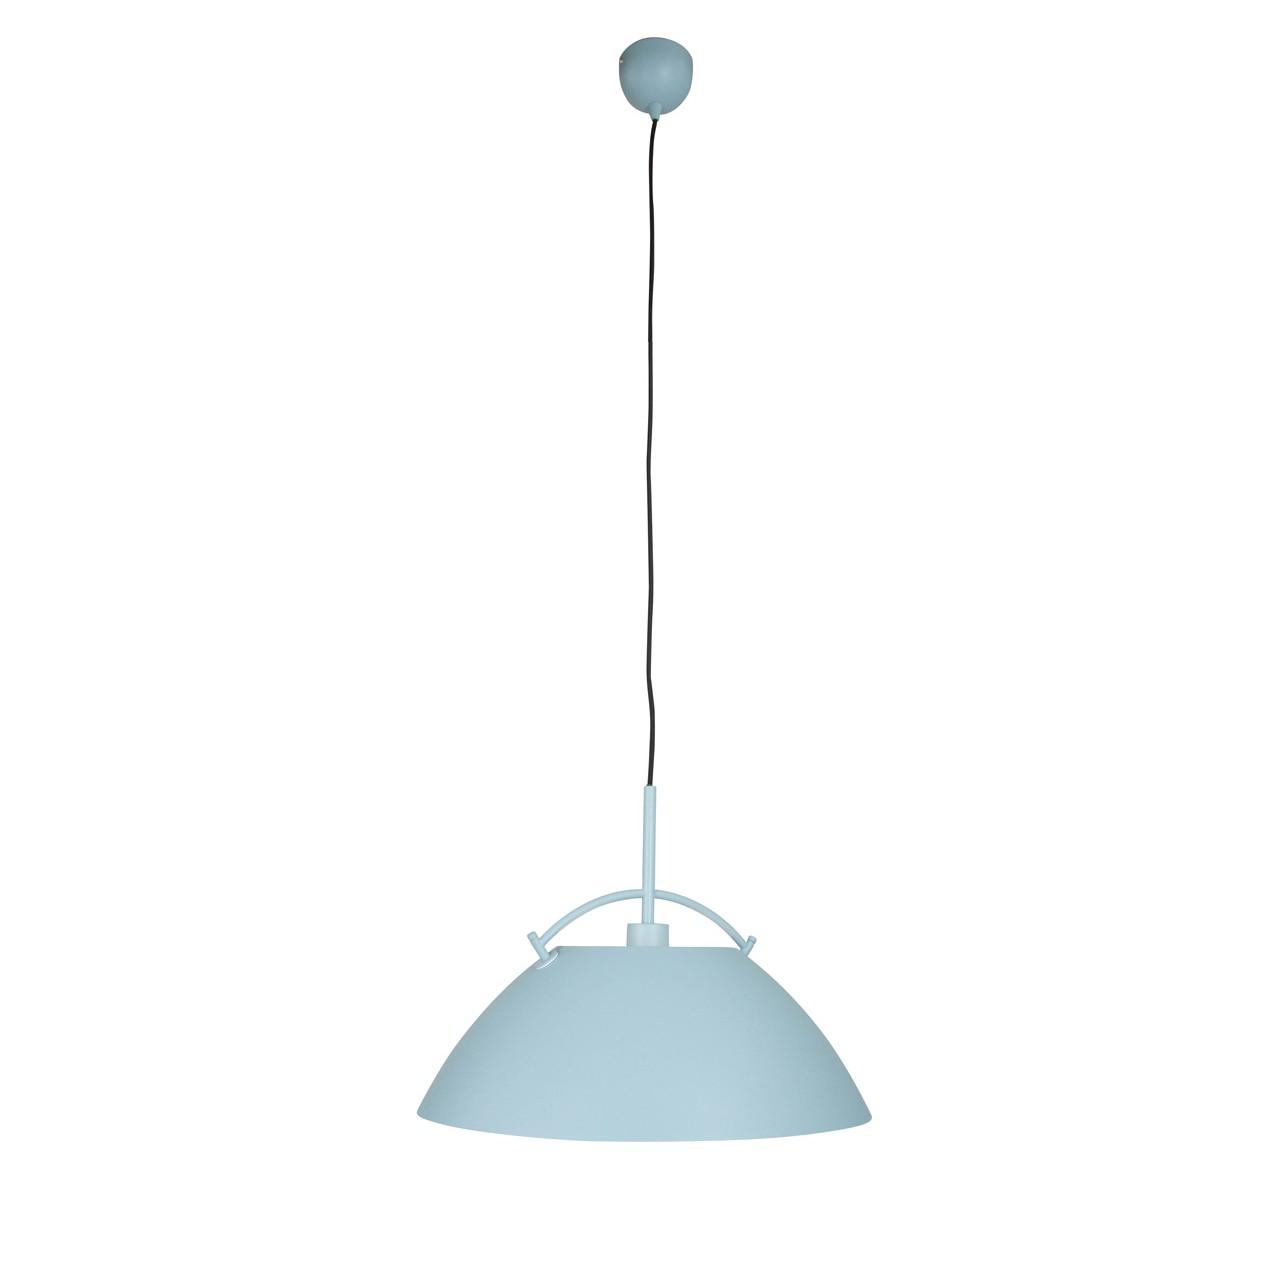 pendelleuchte whistler aluminium blau 1 flammig. Black Bedroom Furniture Sets. Home Design Ideas